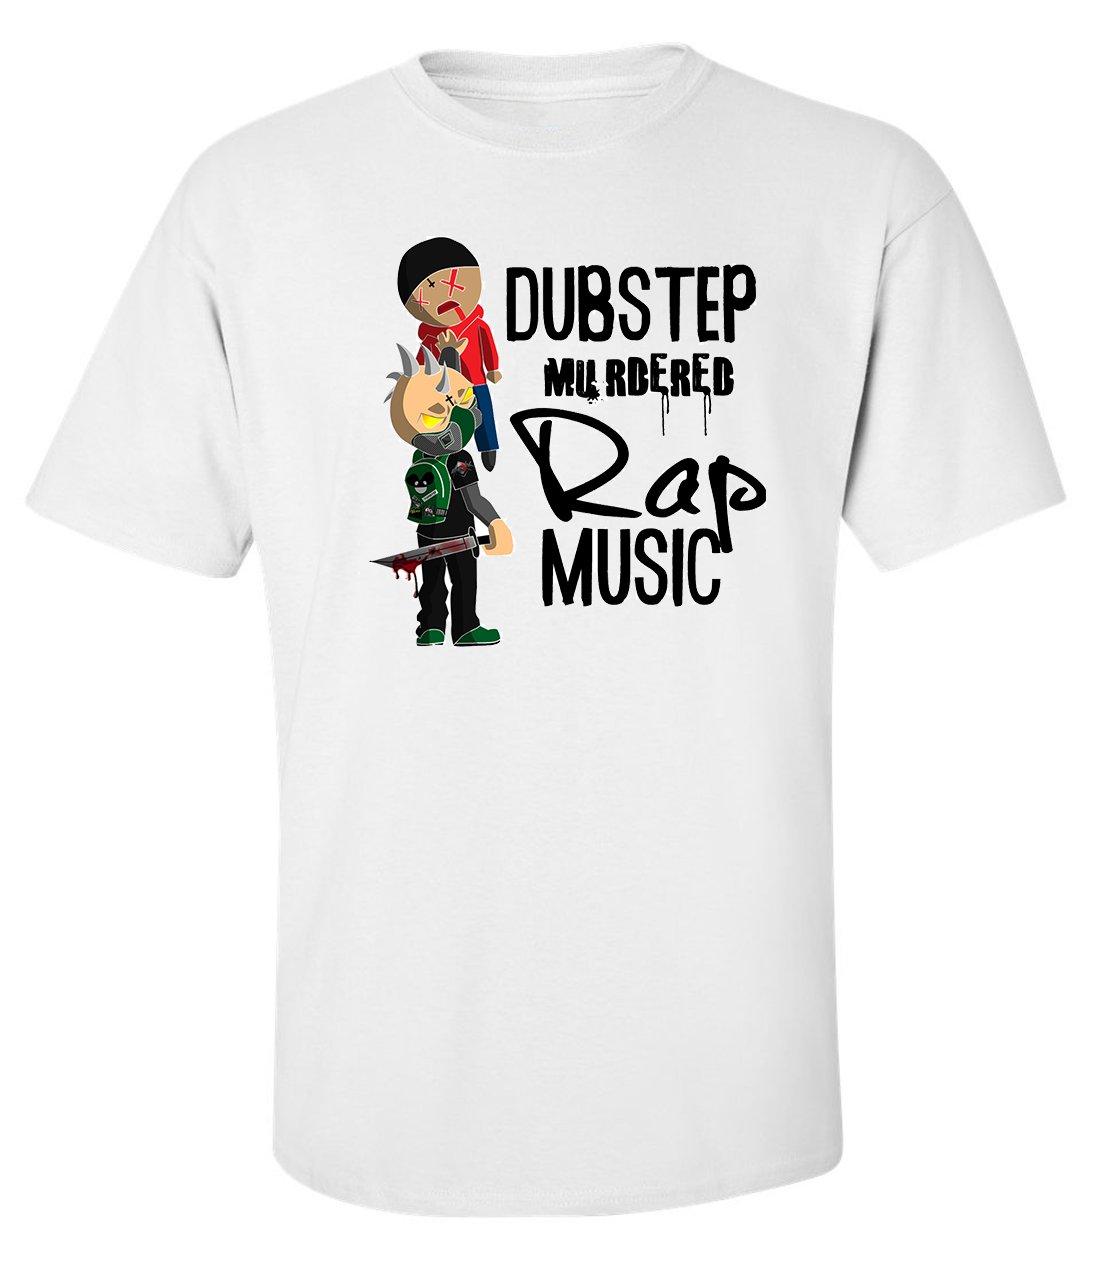 Dubstep murdered rap music men printed white cotton t-shirt size S